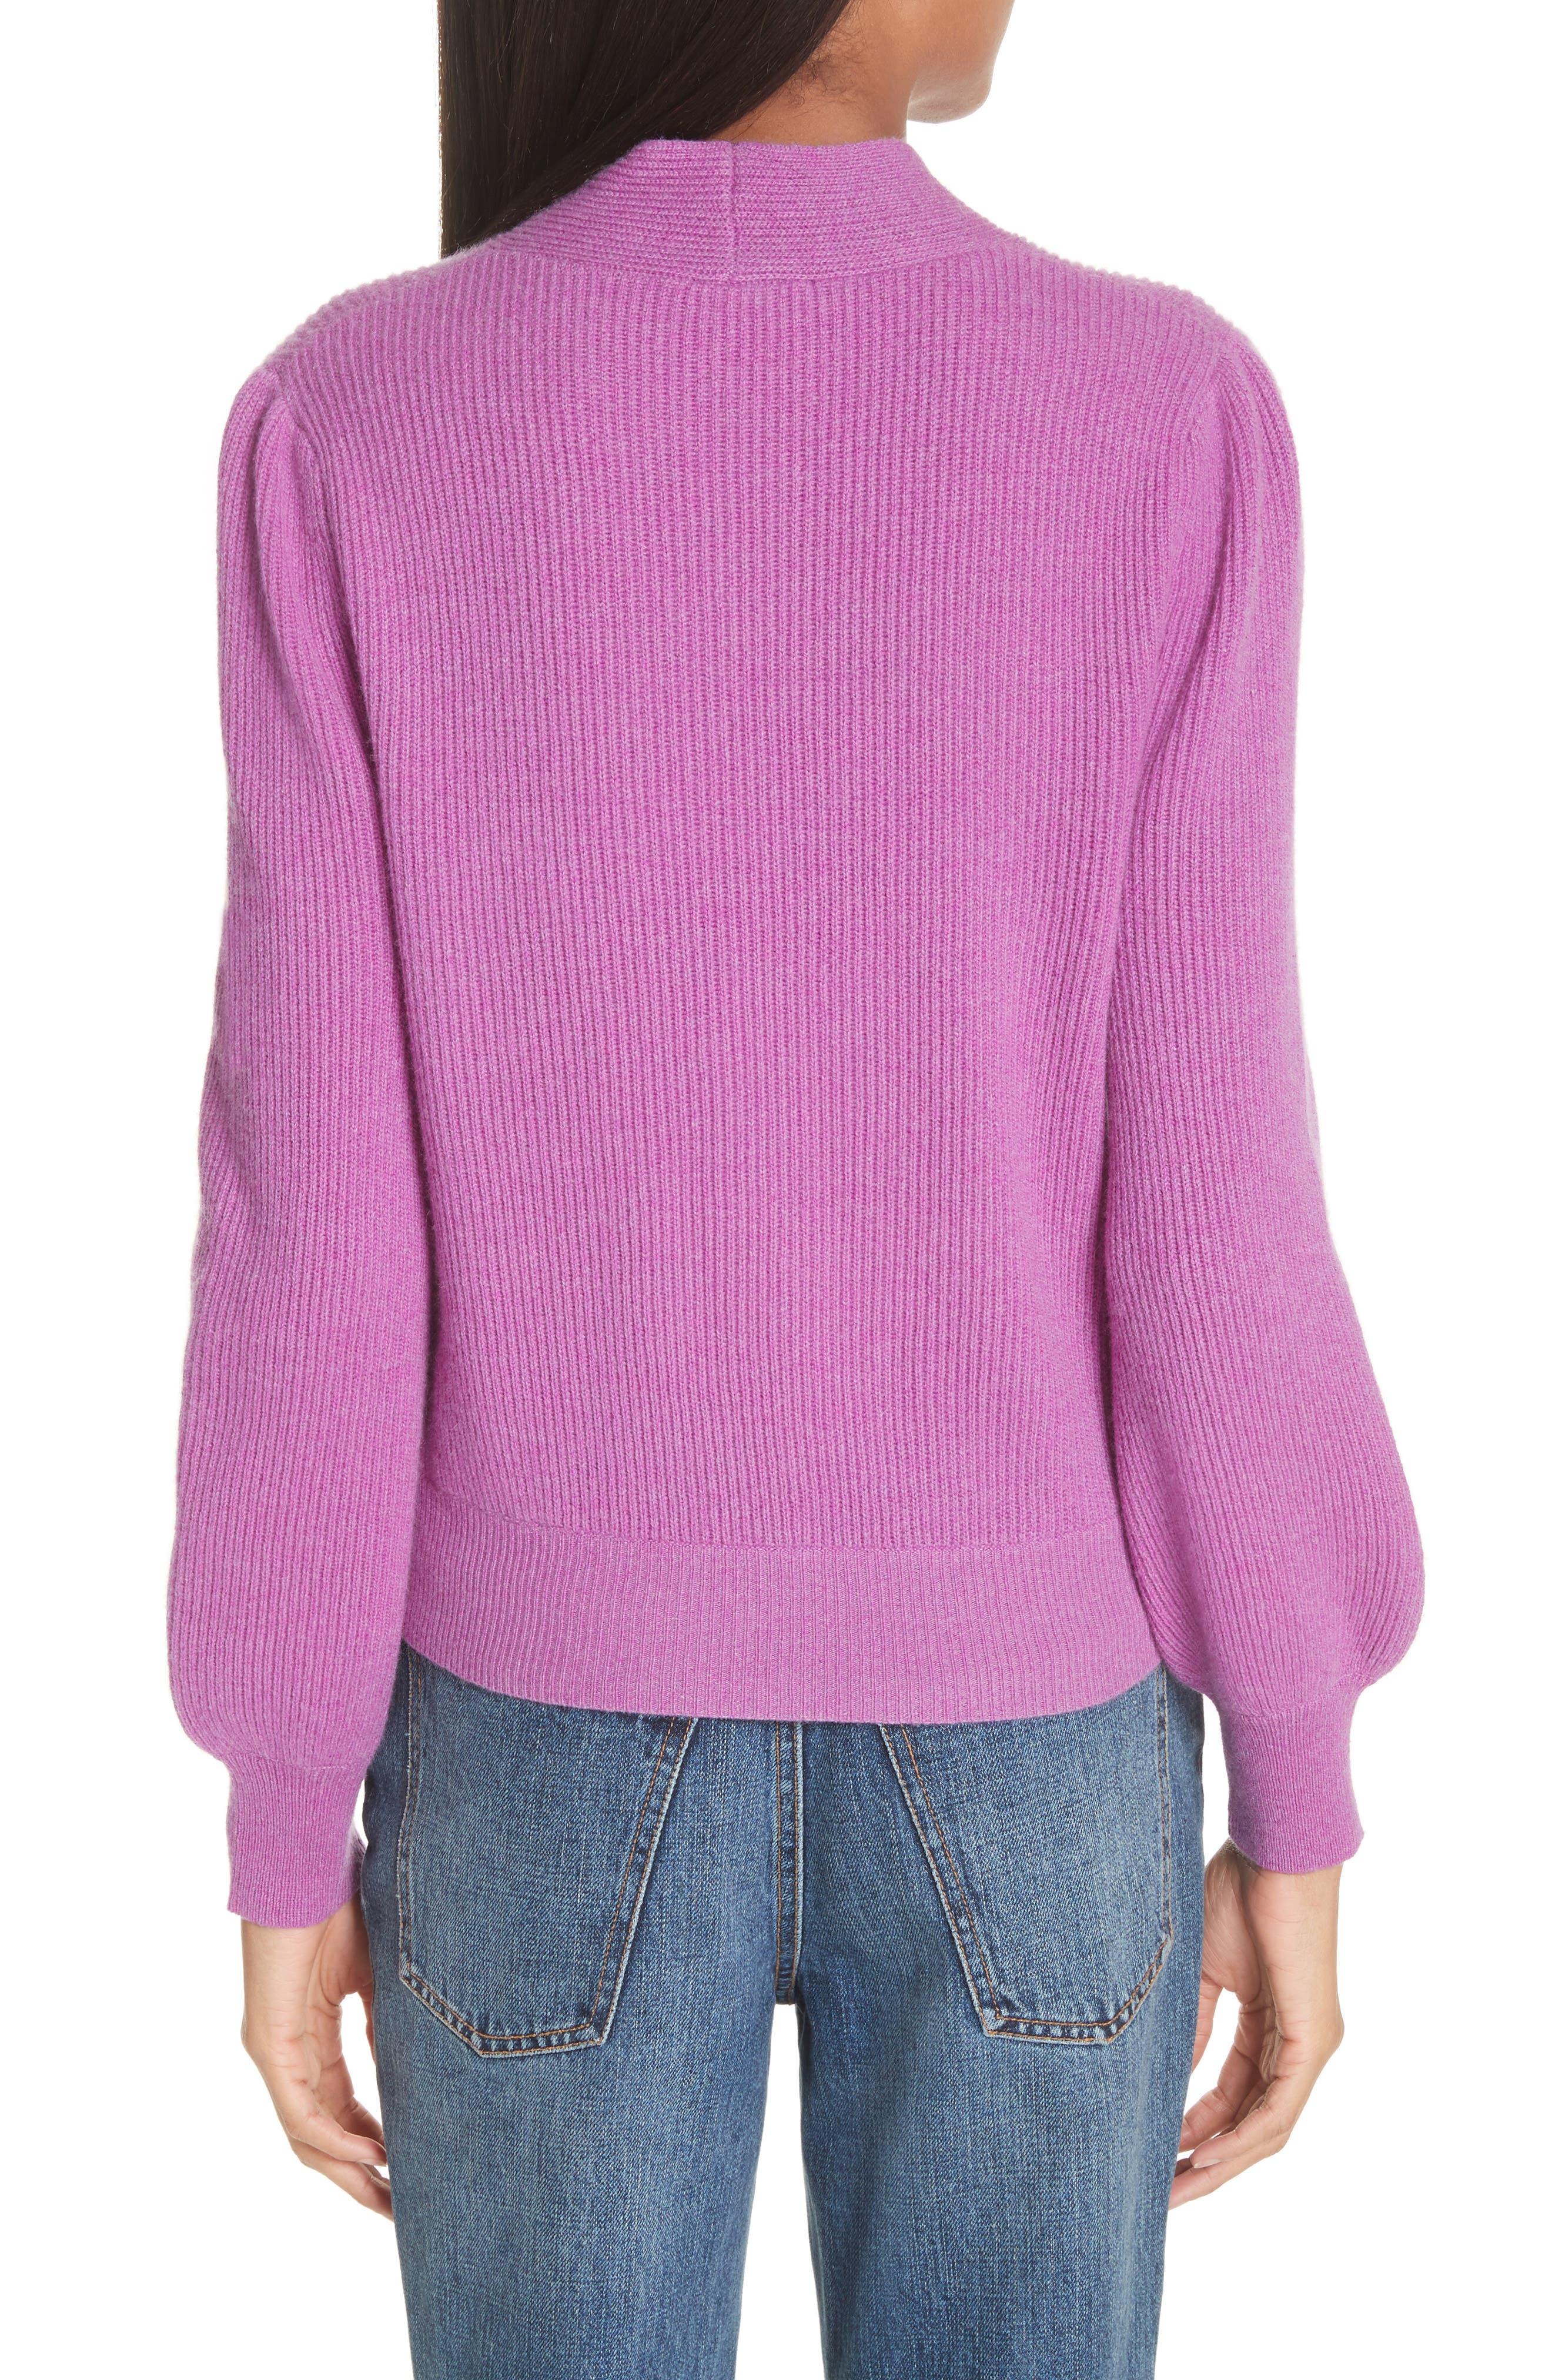 CO,                             Tie Neck Cashmere Sweater,                             Alternate thumbnail 2, color,                             679